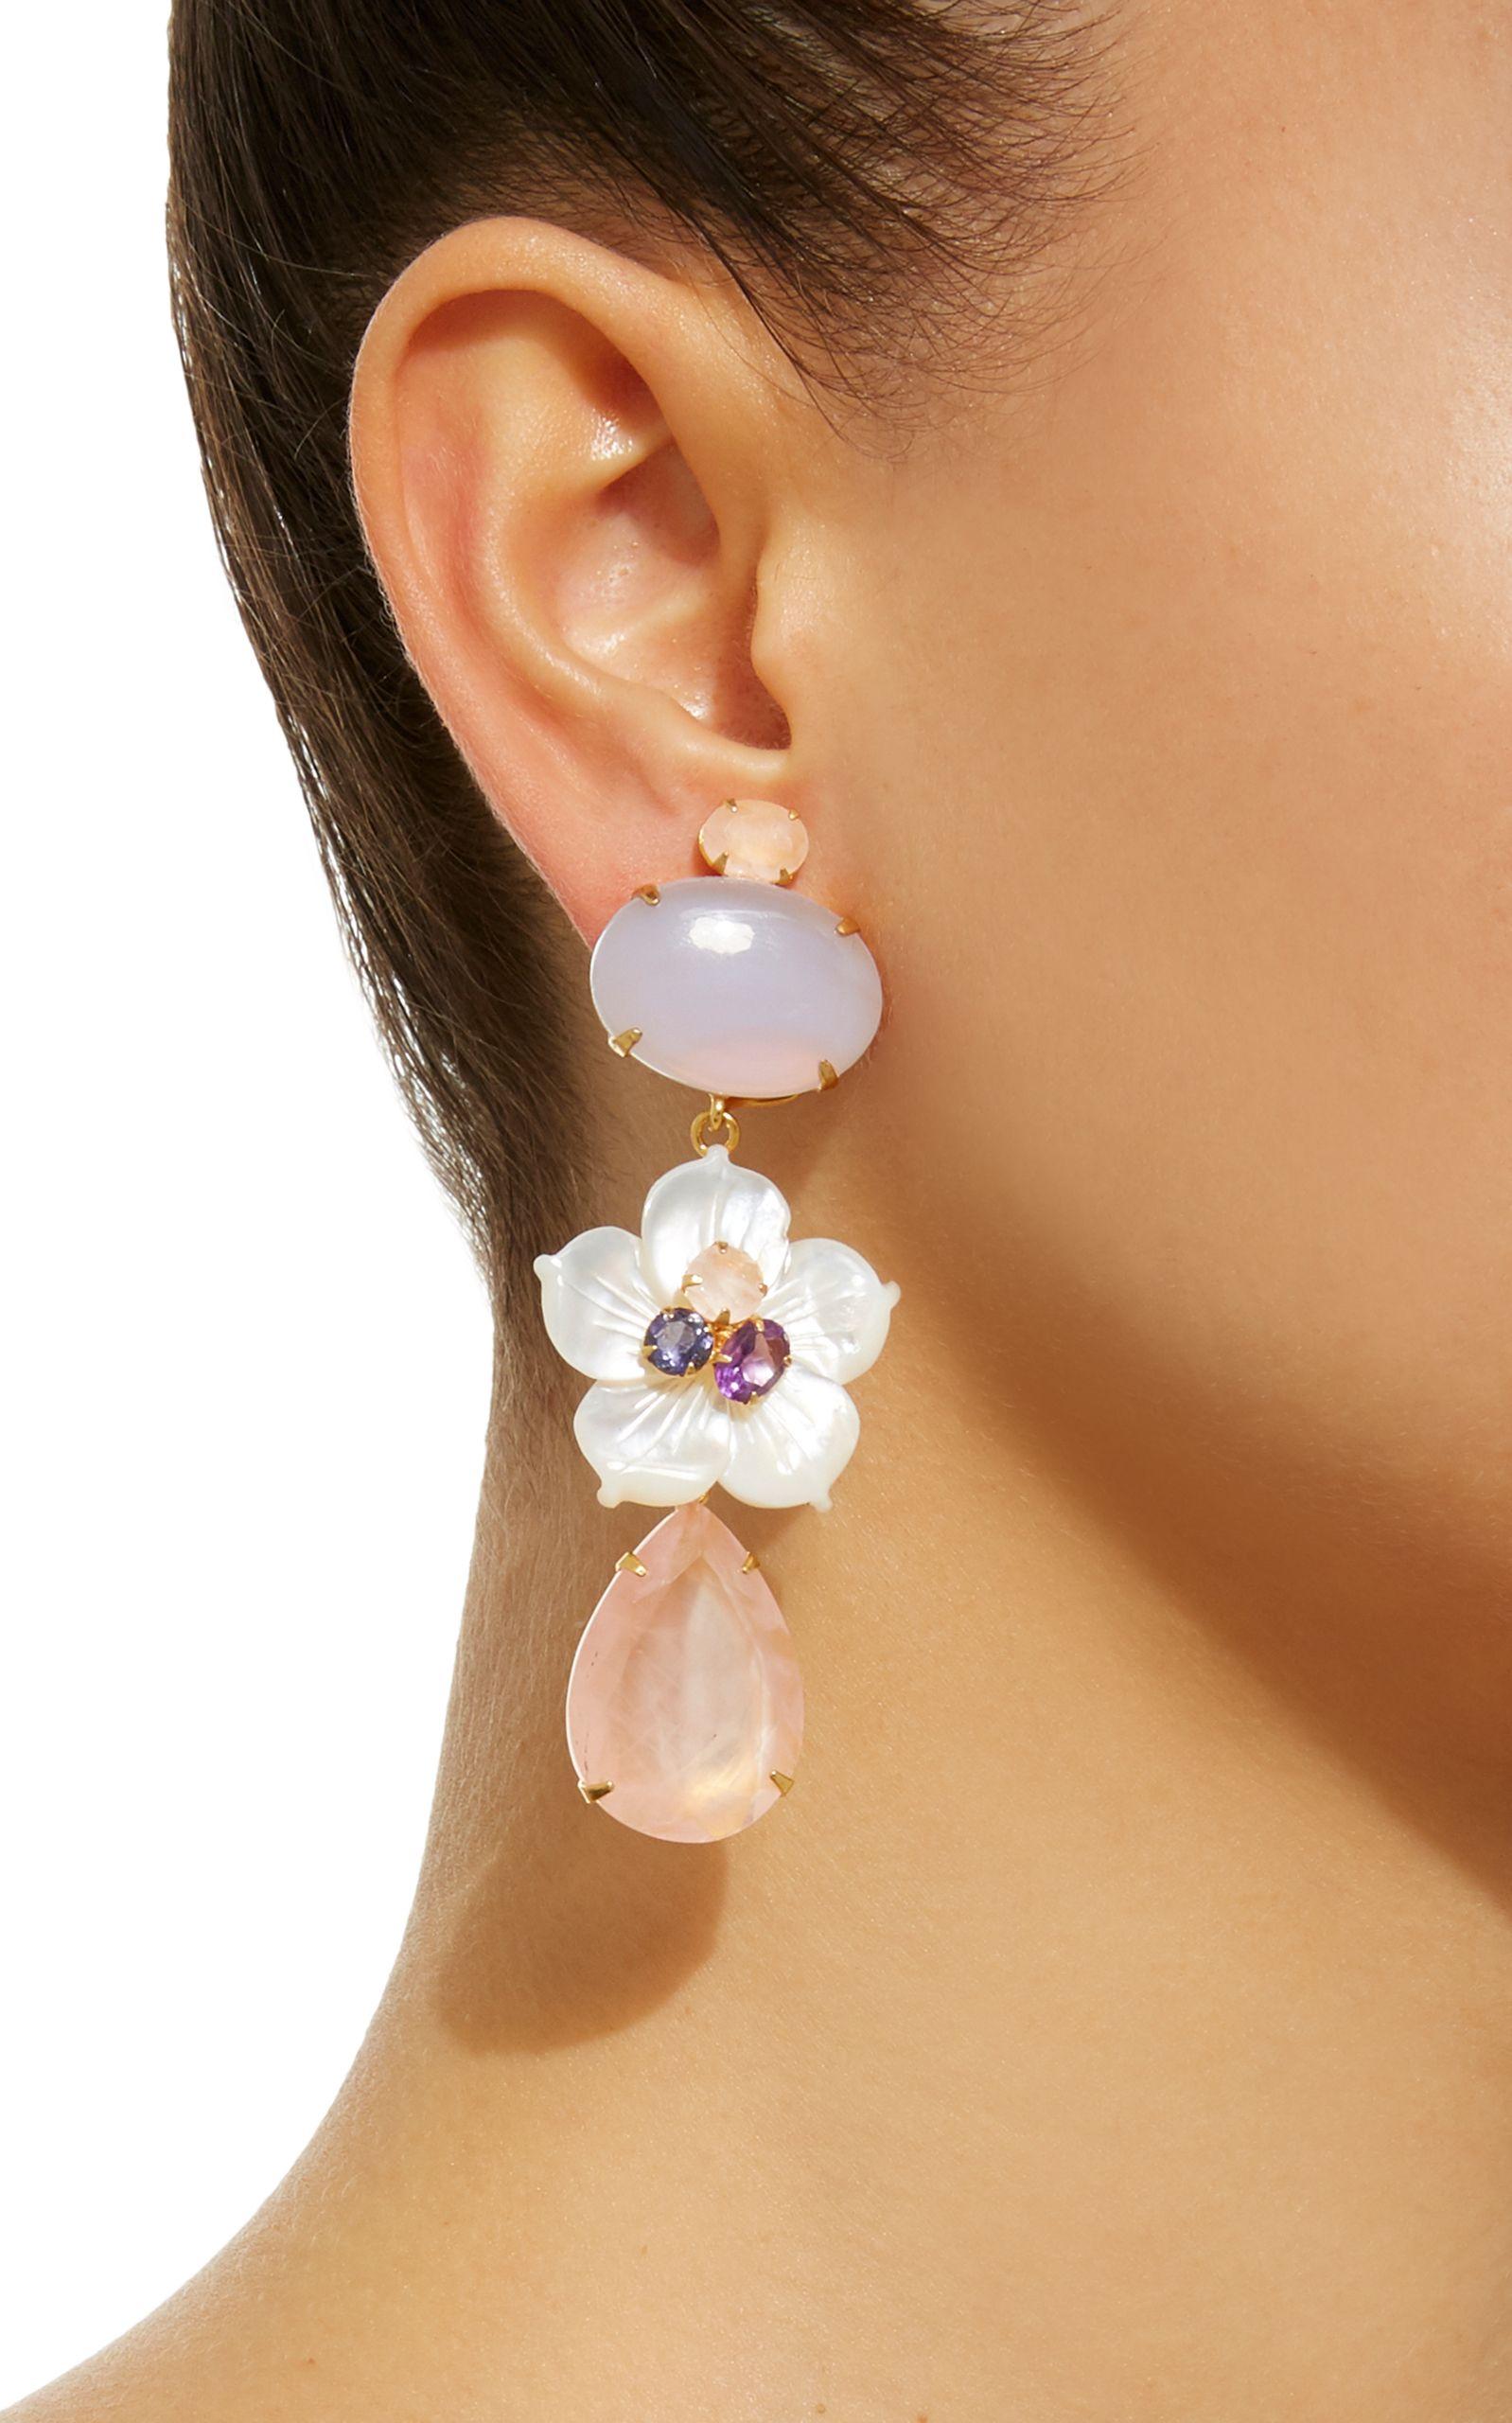 14K Gold-Plated Brass Chalcedony Mother of Pearl Amethyst Lolite Rose Quartz Earrings Bounkit ioeRRkoZ